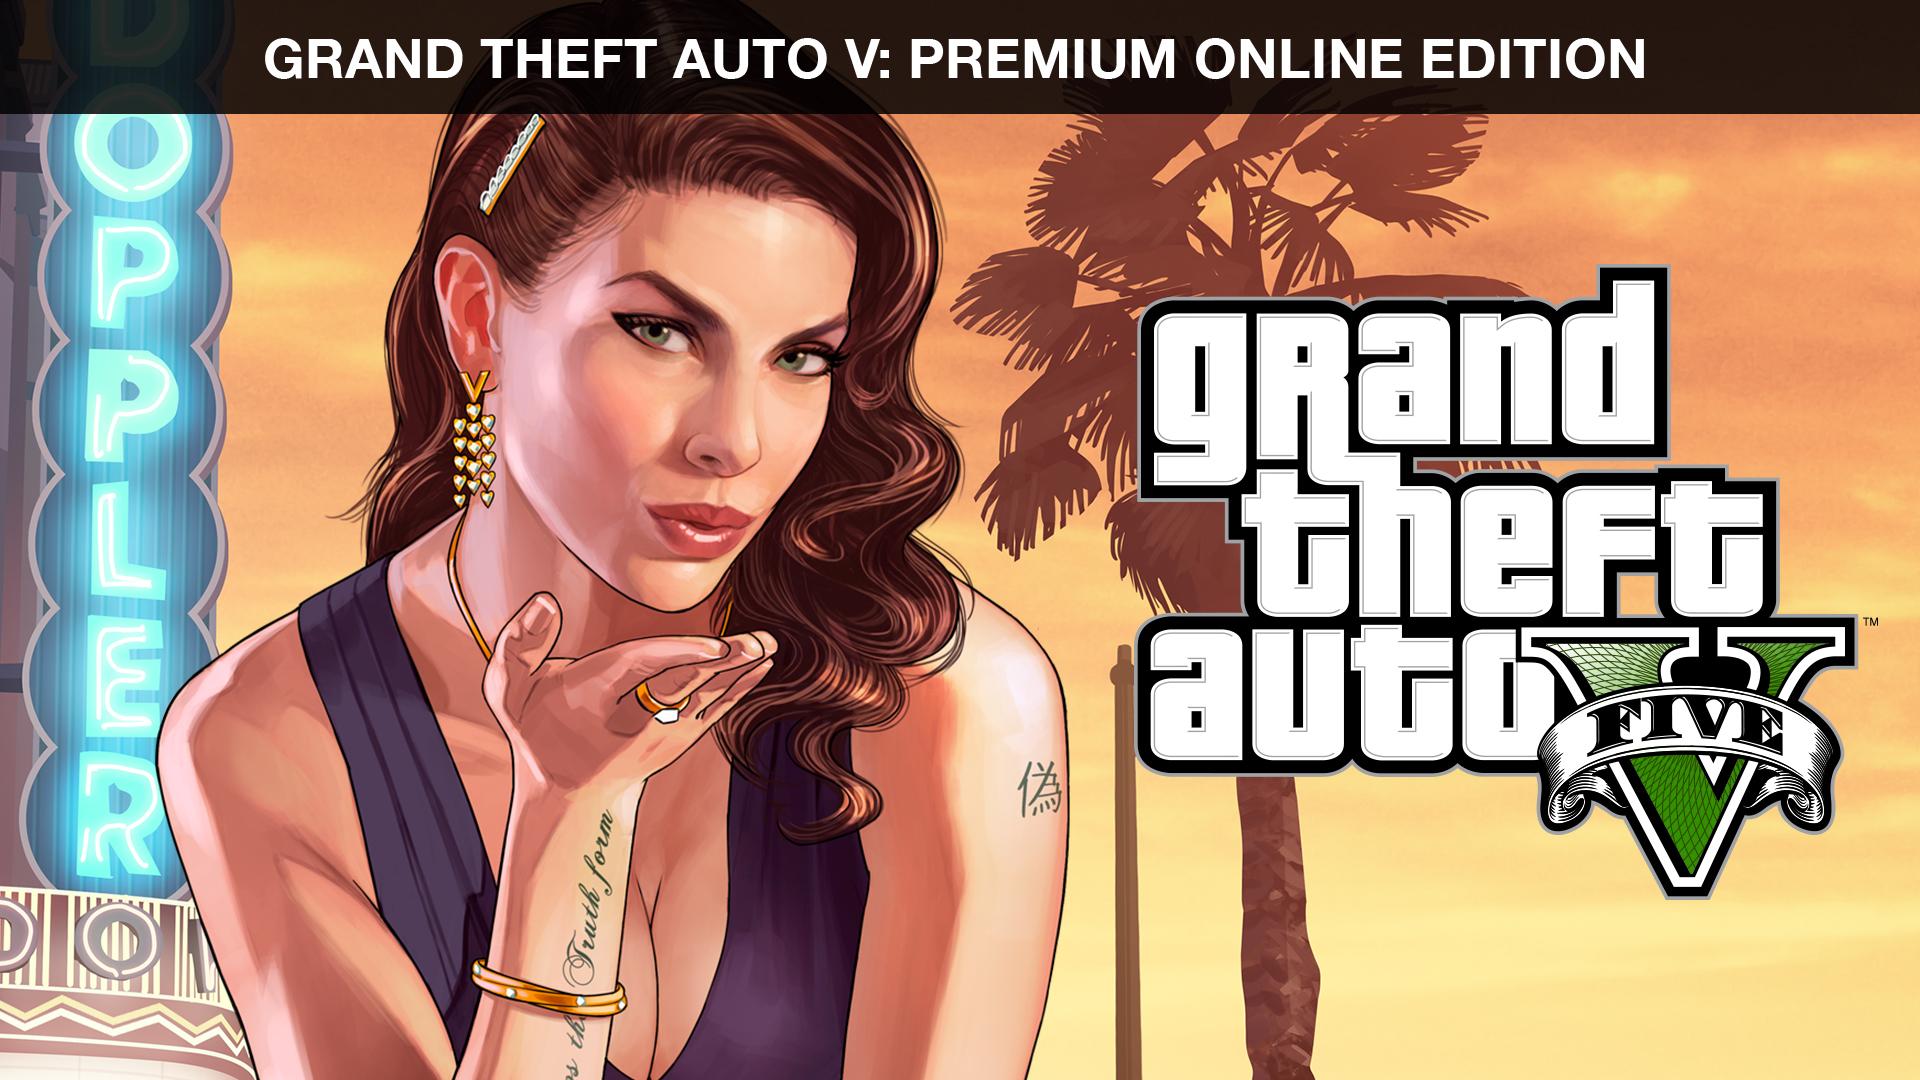 GRAND THEFT AUTO V: PREMIUM ONLINE EDITION | PC Rockstar